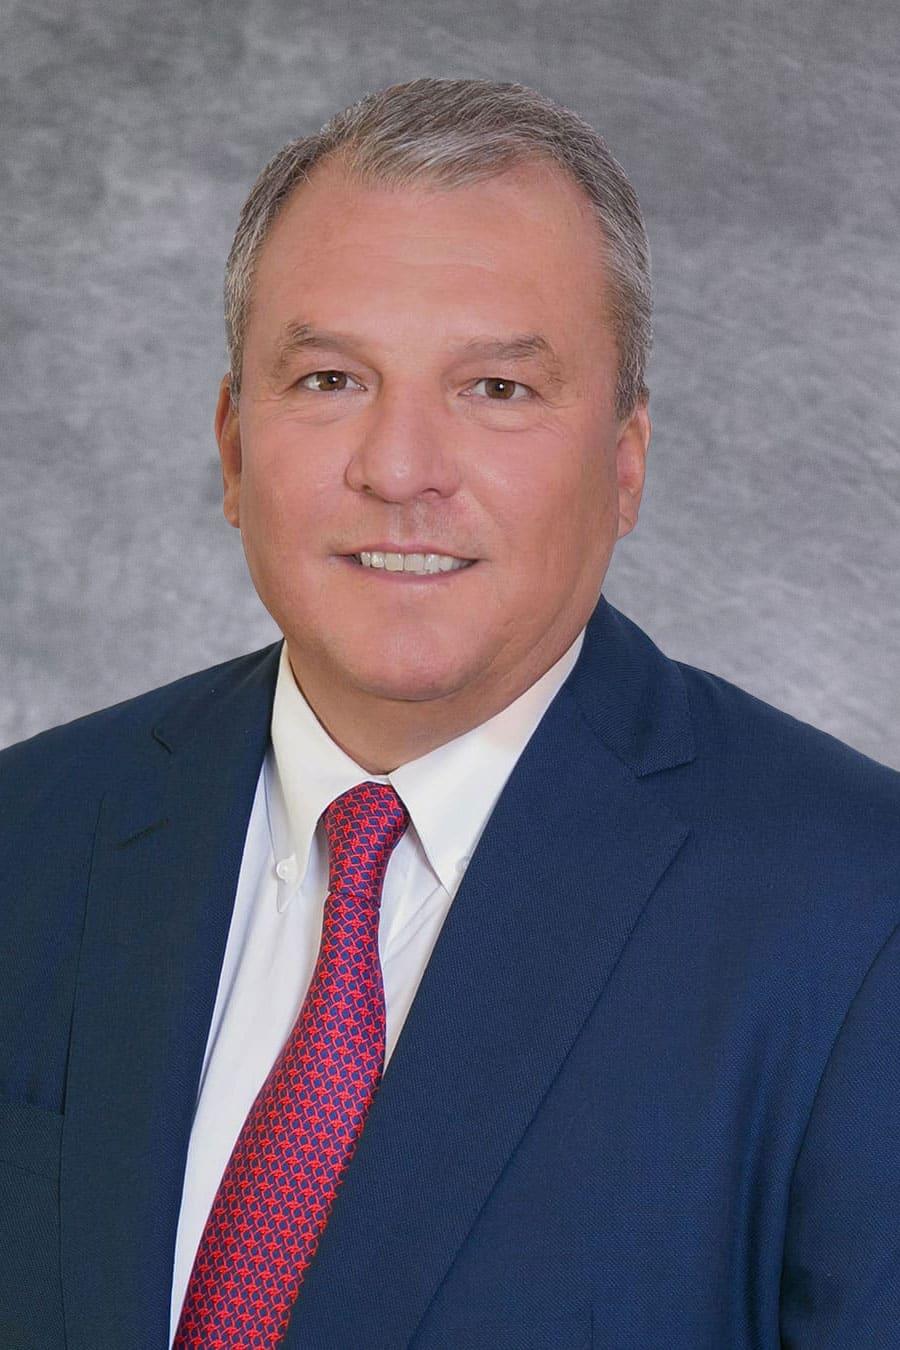 Steven M. Gonzalez